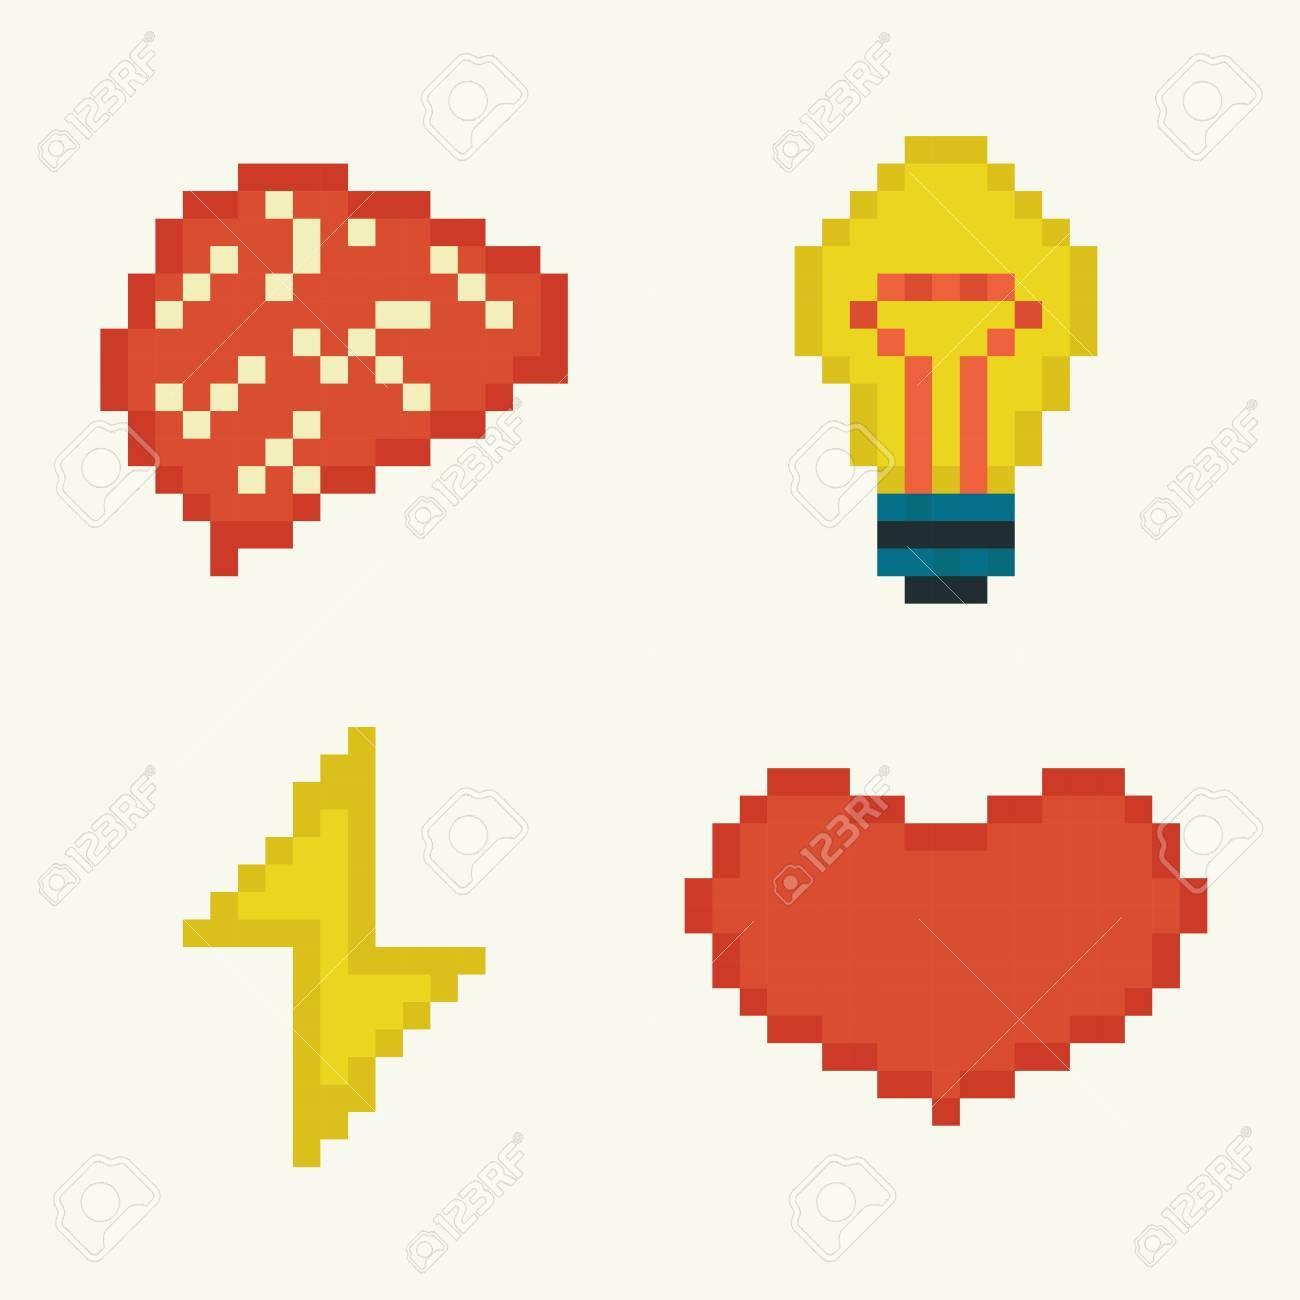 health icons design vector Stock Vector - 20980825